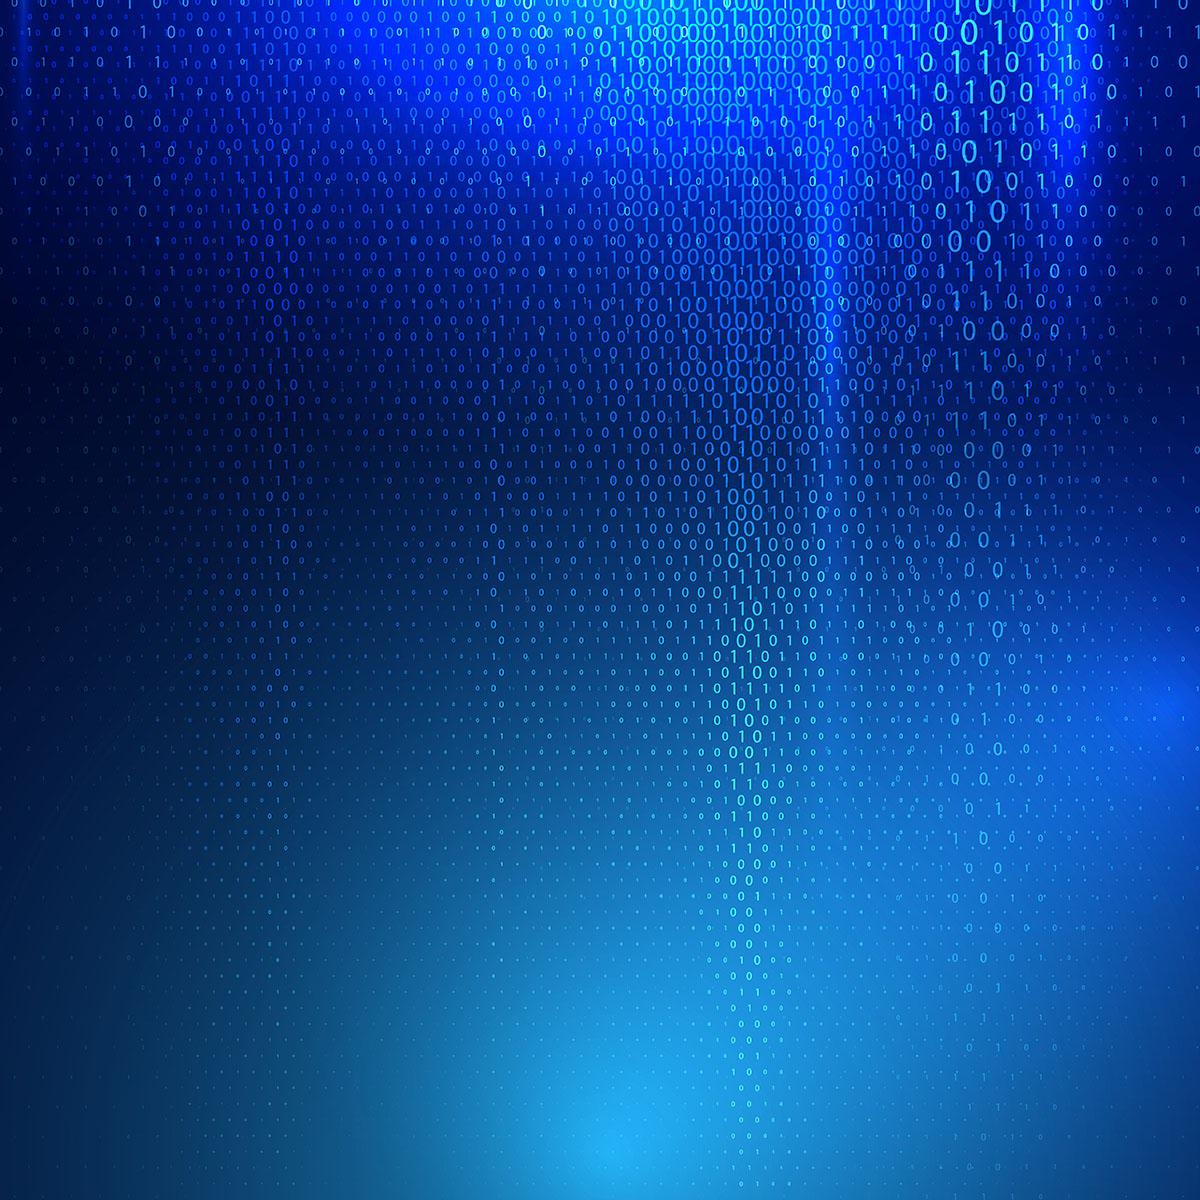 Binary code free vector art 4398 free downloads - Binary background gif ...